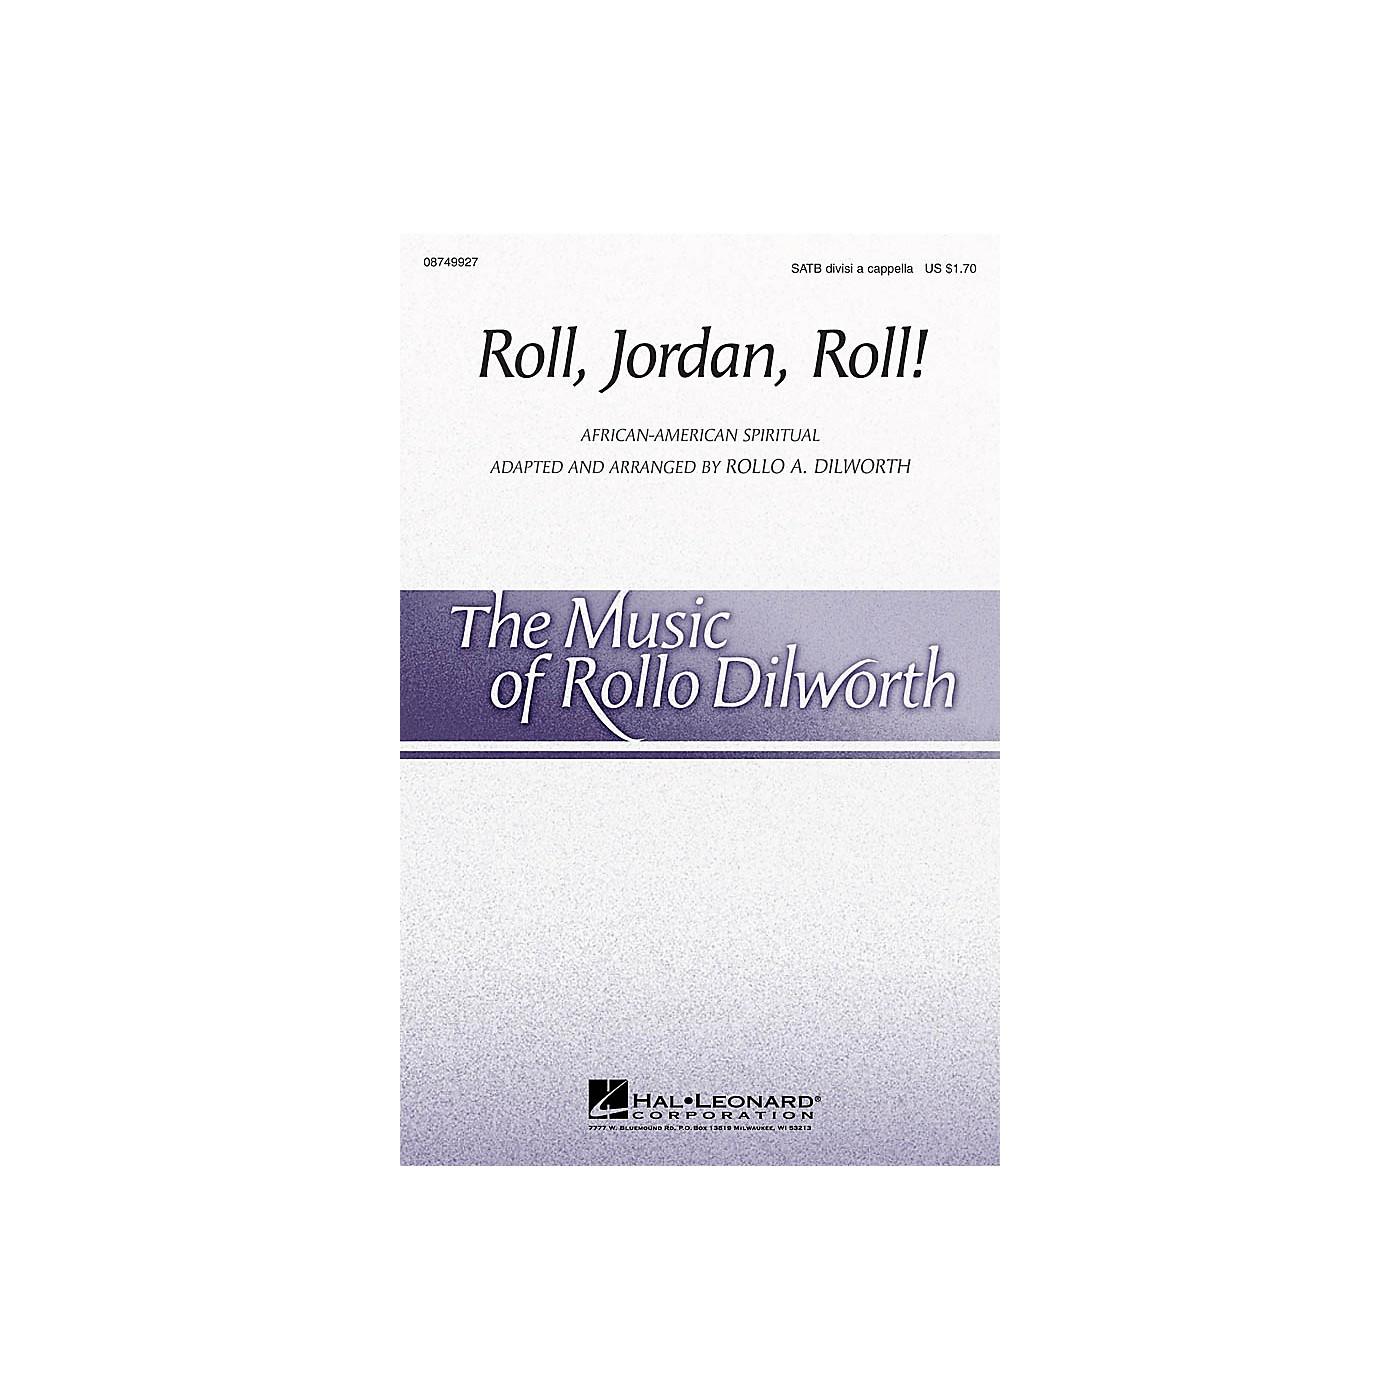 Hal Leonard Roll, Jordan, Roll! SATB DV A Cappella arranged by Rollo Dilworth thumbnail